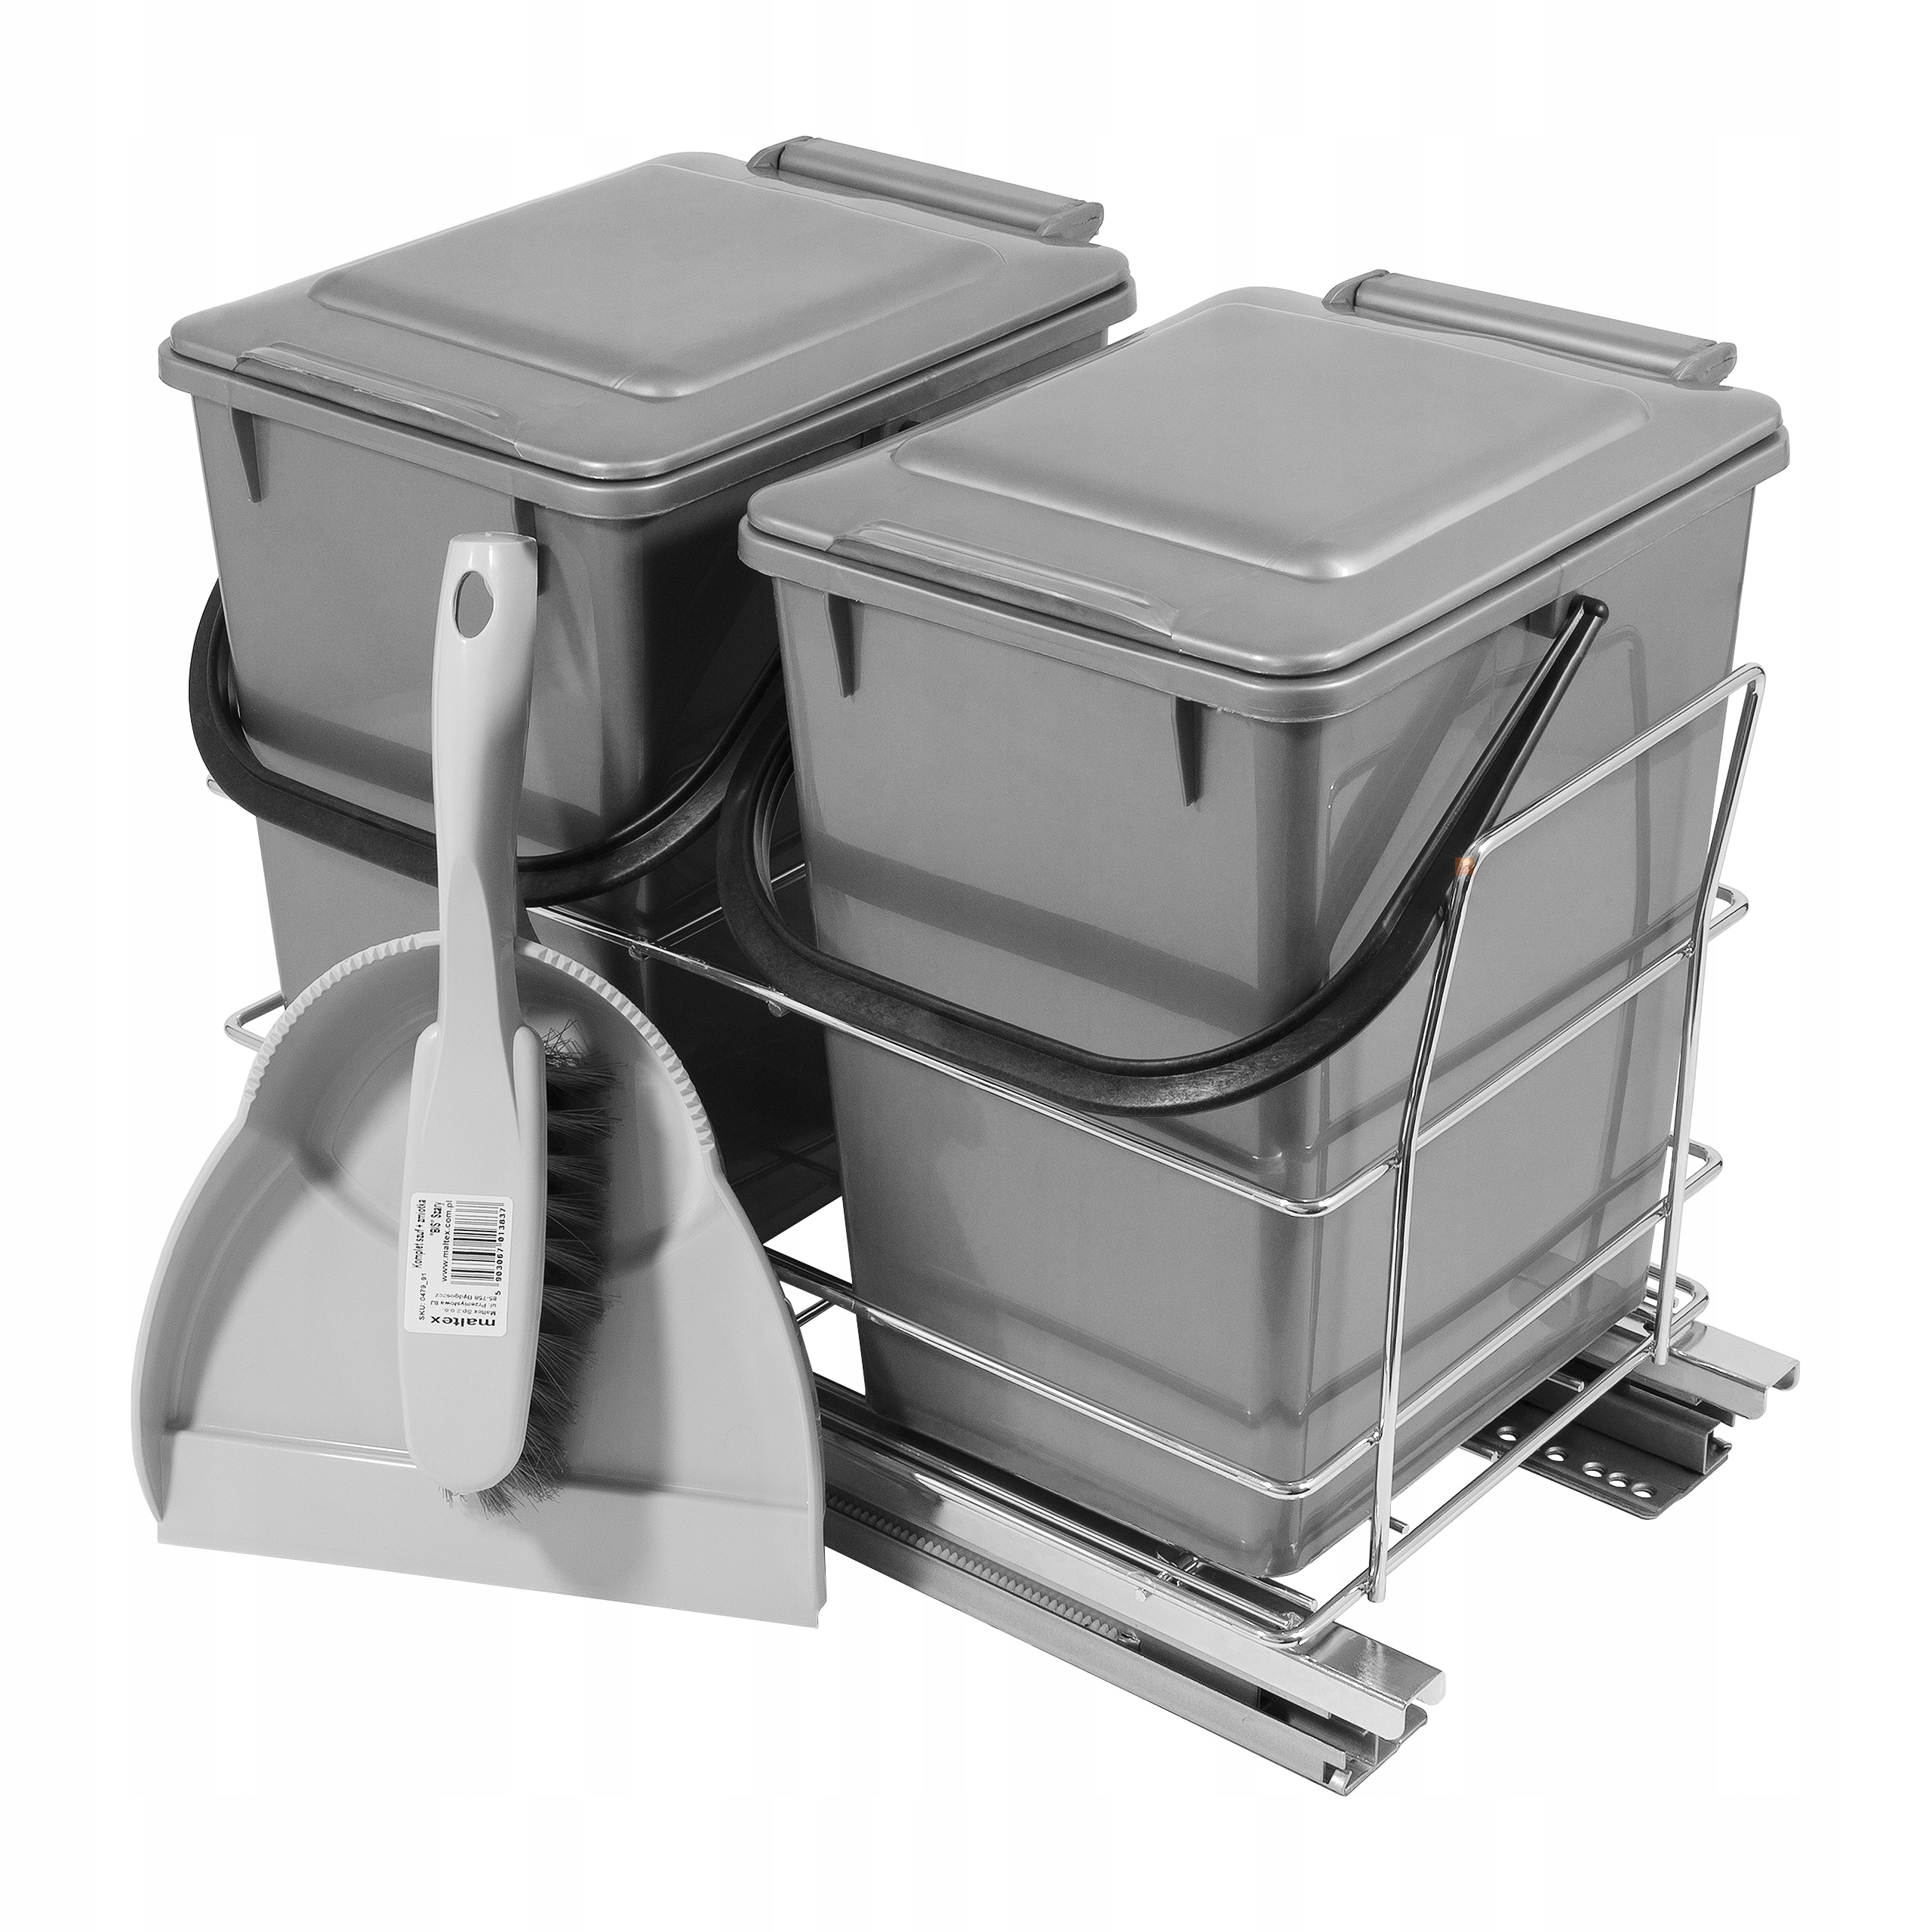 Košík Výsuvné vysávač na odpadky - TICHÝ DOM